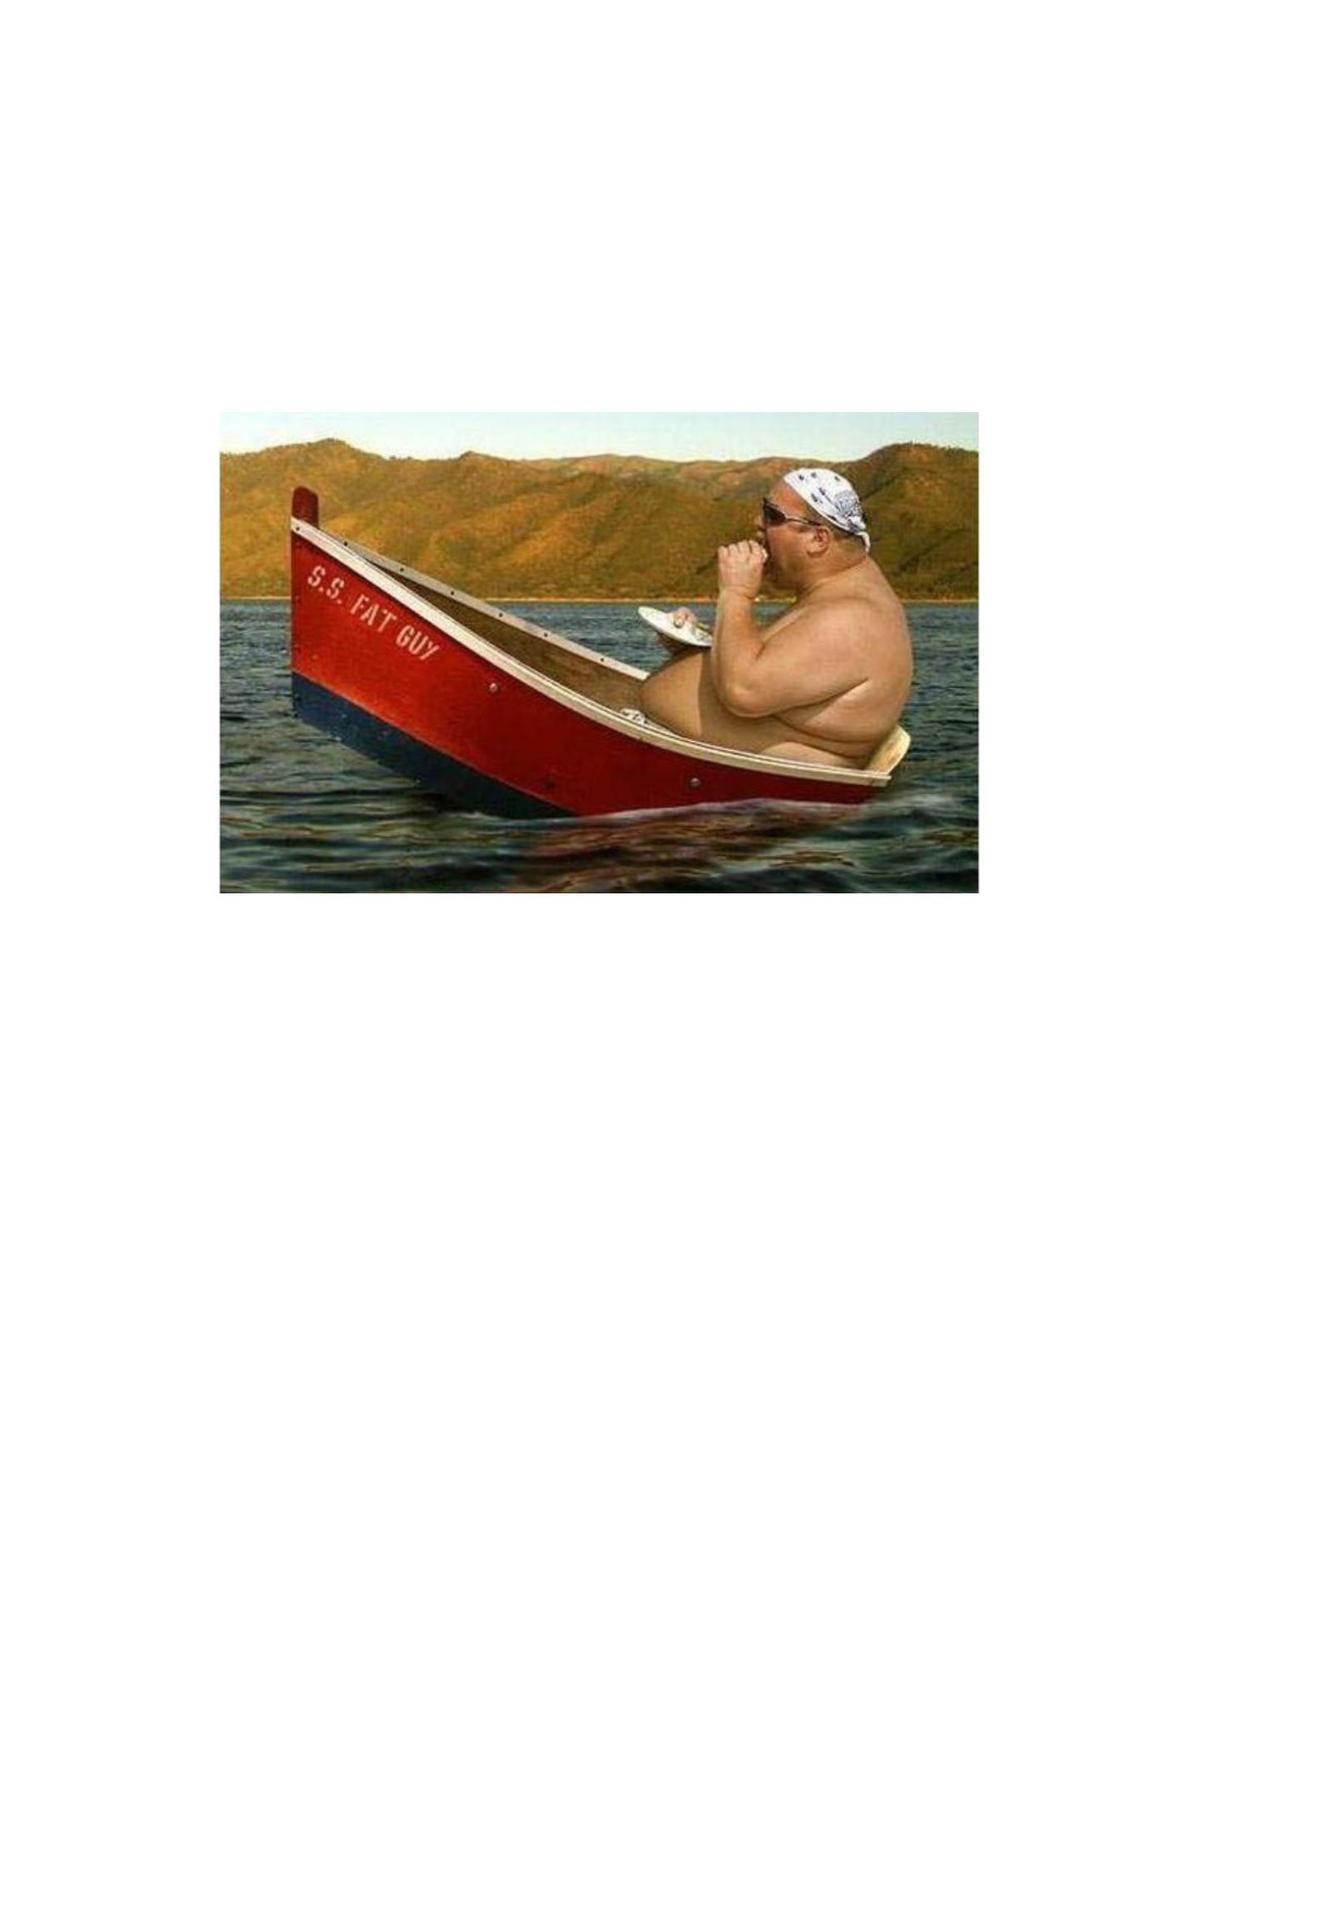 Click image for larger version.  Name:fatguy_boat.jpg Views:65 Size:67.6 KB ID:150075